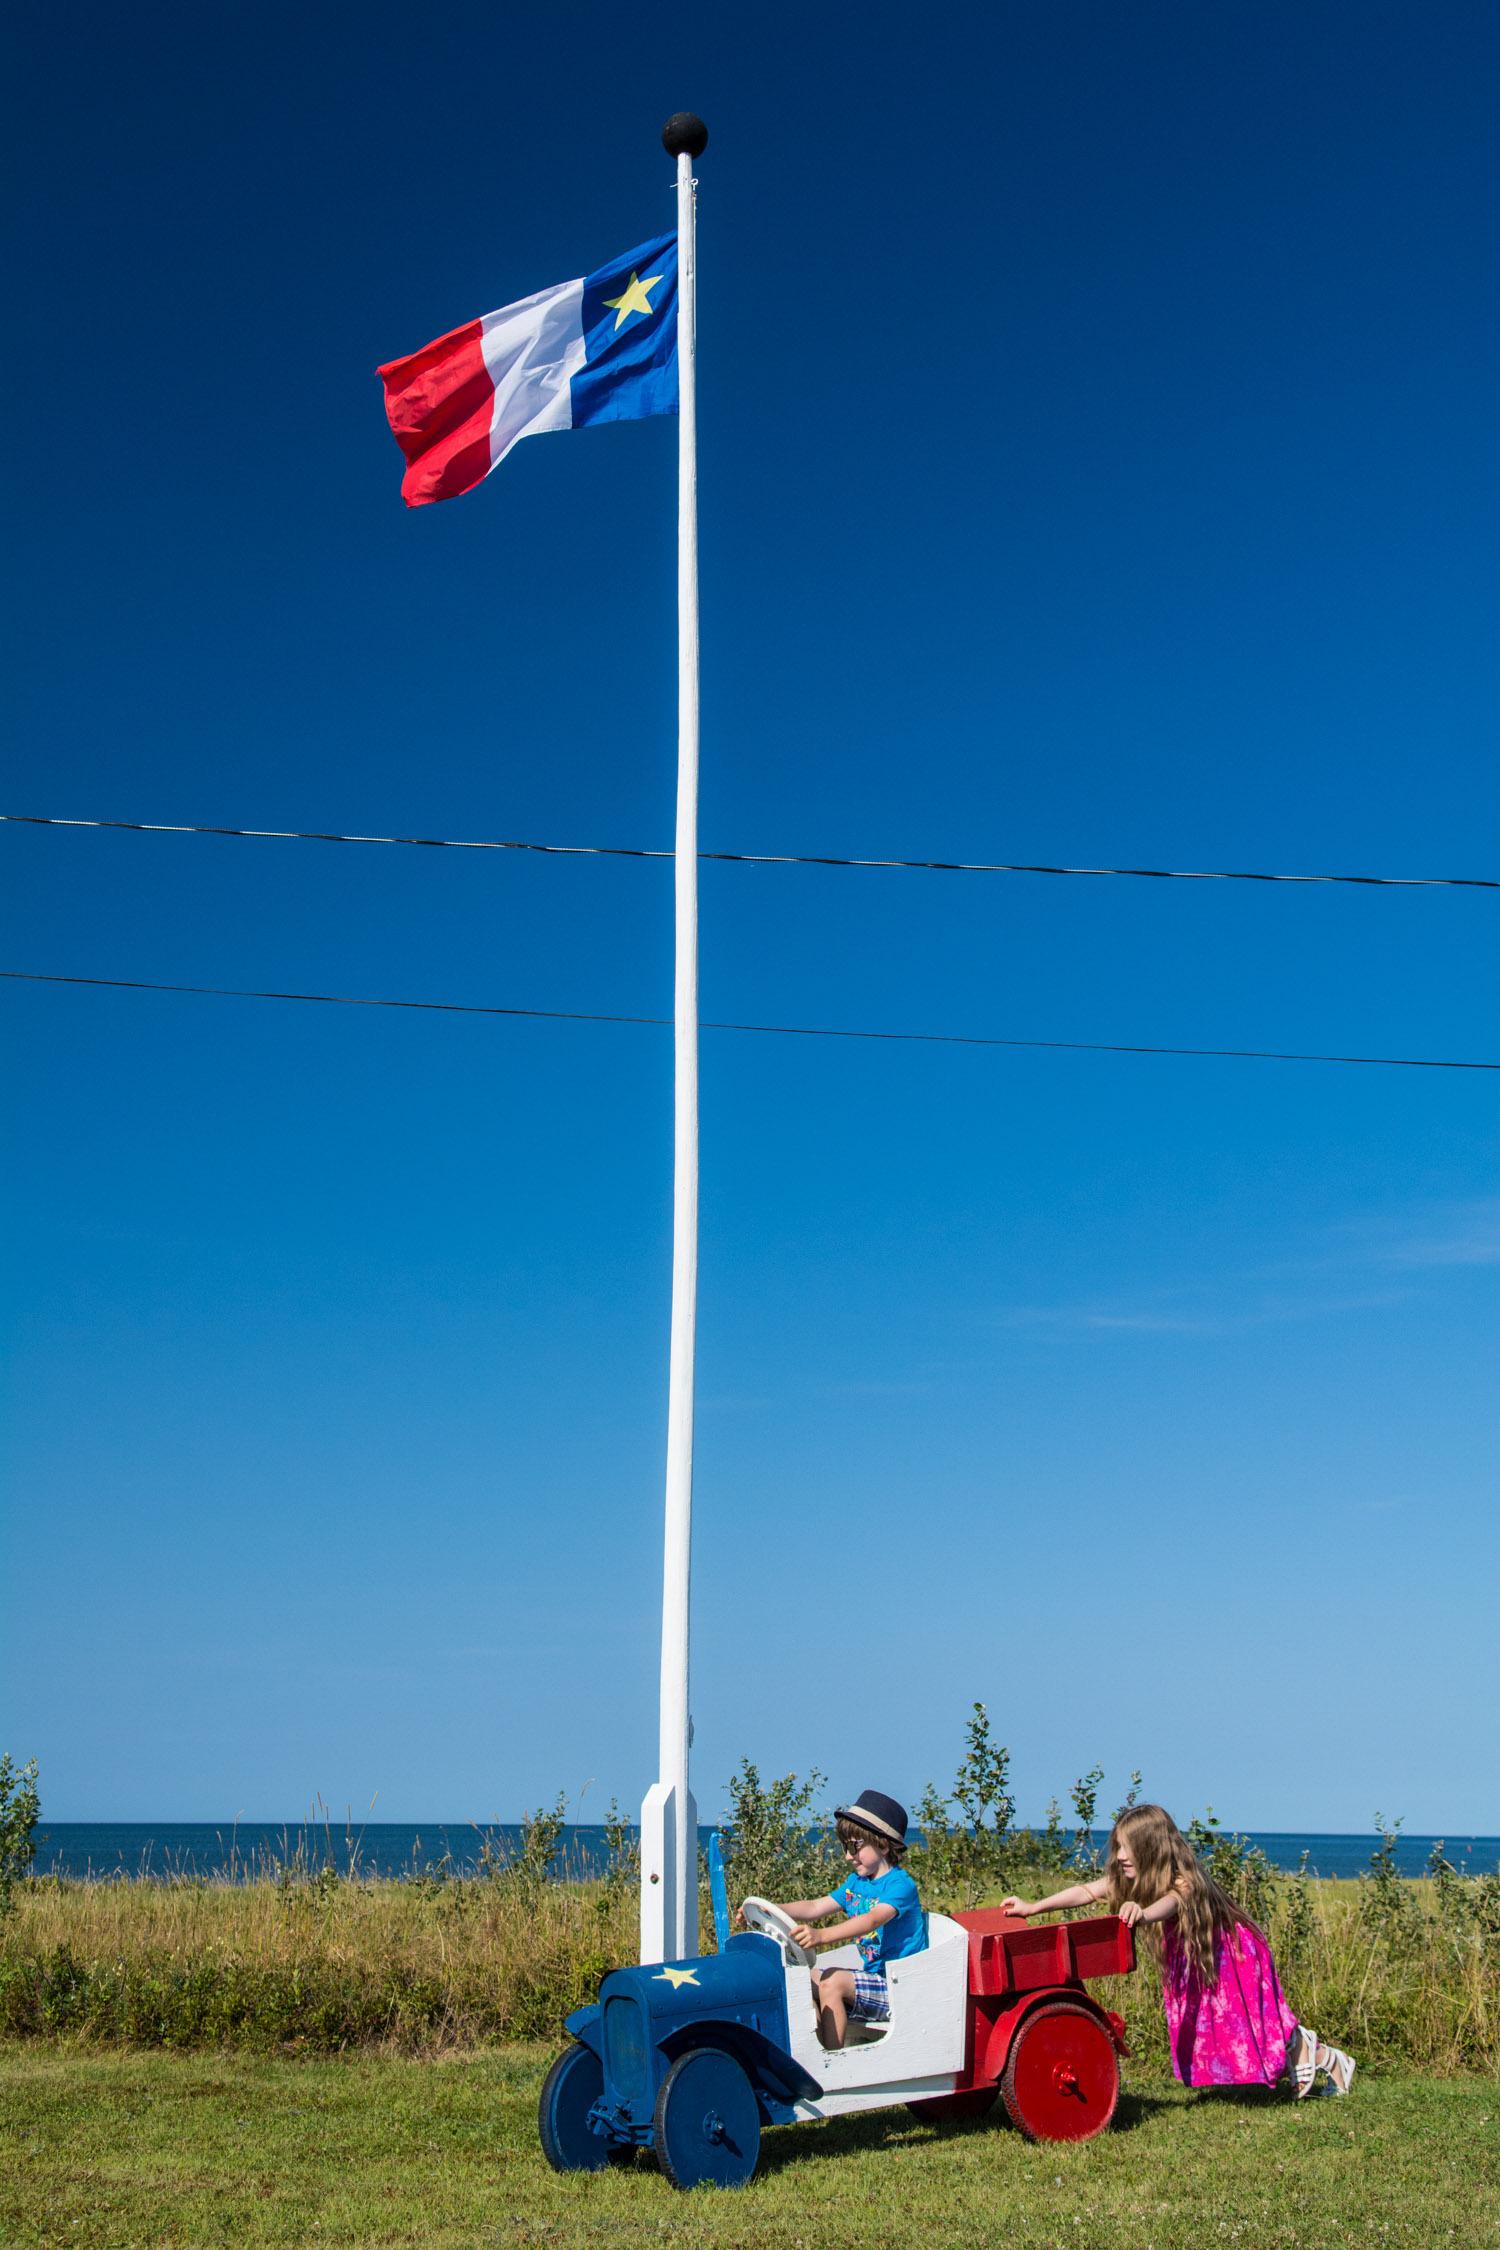 aug10-15 2014-Tourism New Brunswick-T4G Kick-summer 2014-Miramichi-Bathurst-Caraquet-Shippagan-Miscou Island-NB-web res jpg-photo by Aaron McKenzie Fraser-www.amfraser.com_AMF3428.jpg